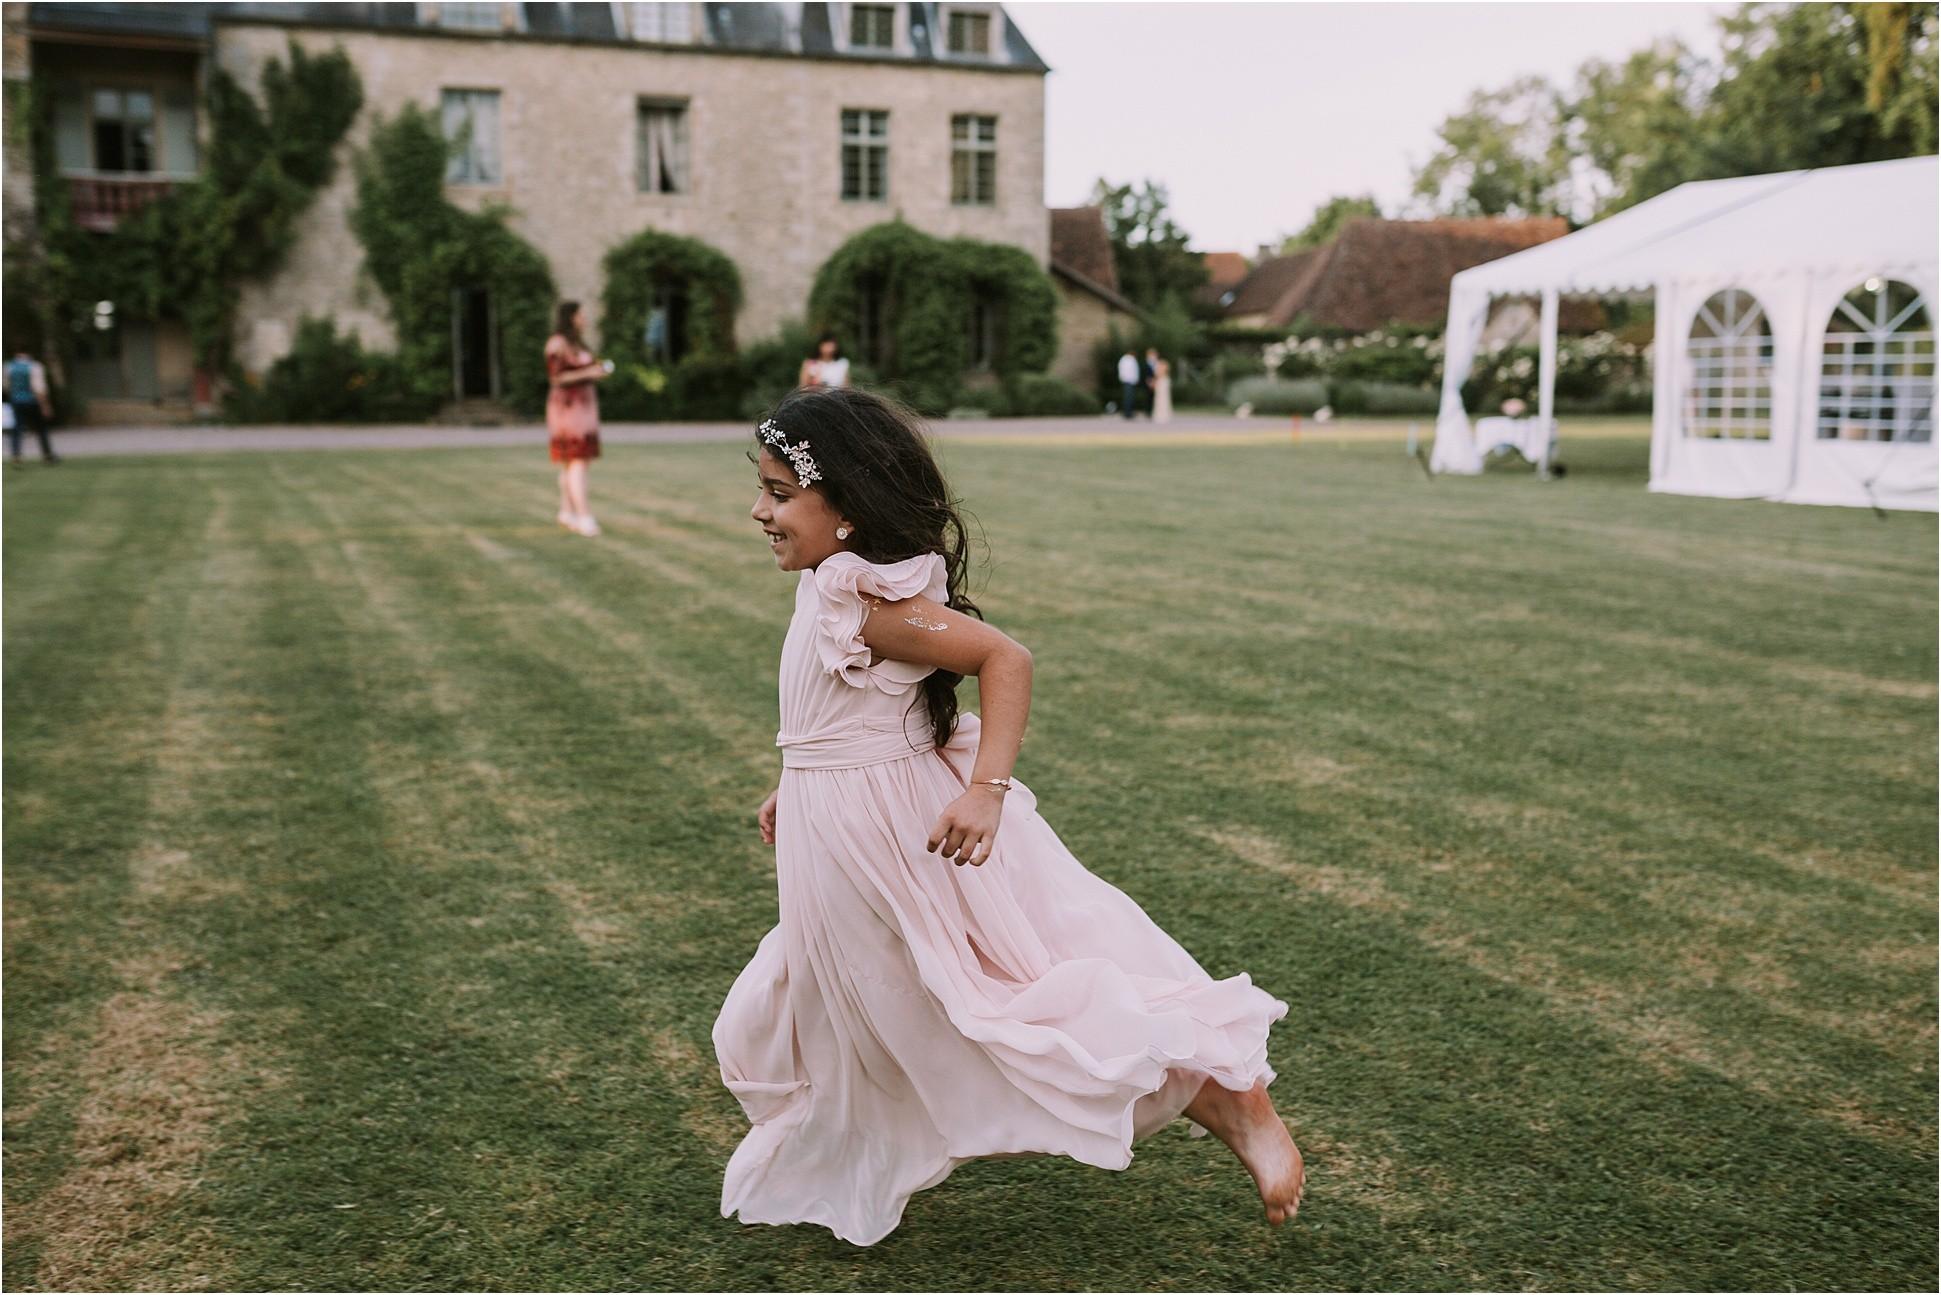 Kateryna-photos-photographe-mariage-chateau-st-paterne-mayenne-normandie_0194.jpg